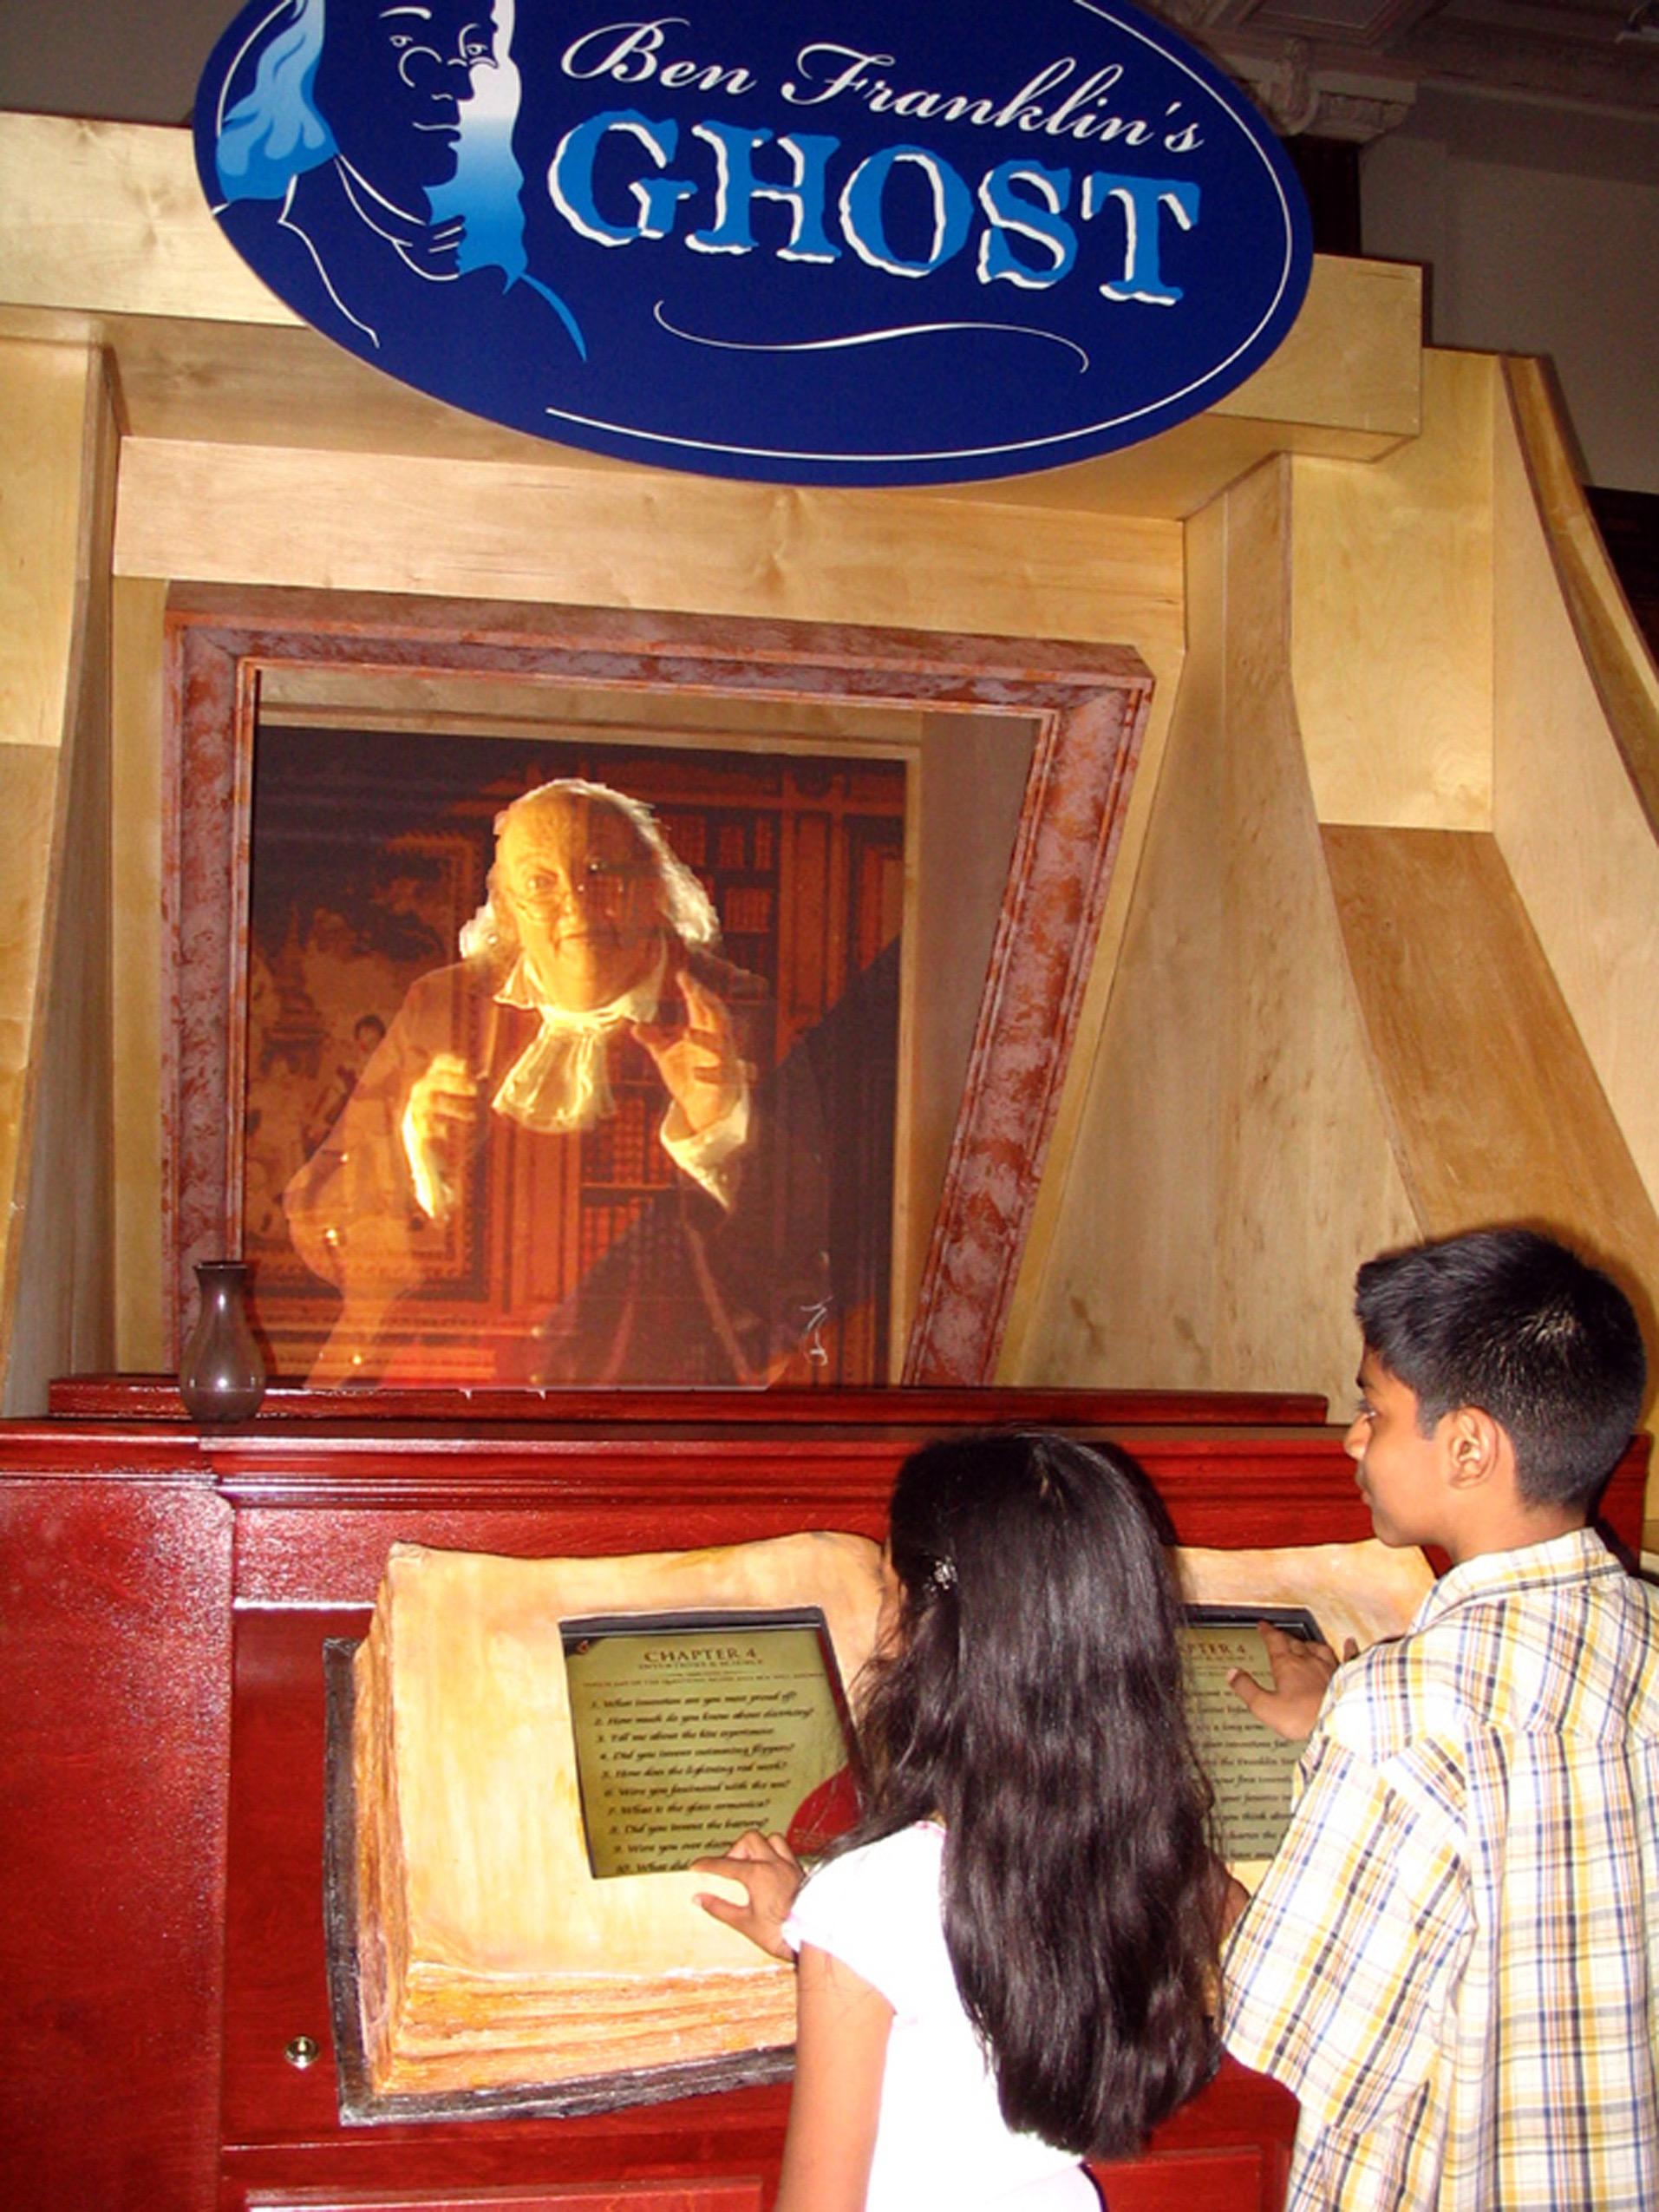 Ben Franklin's Ghost